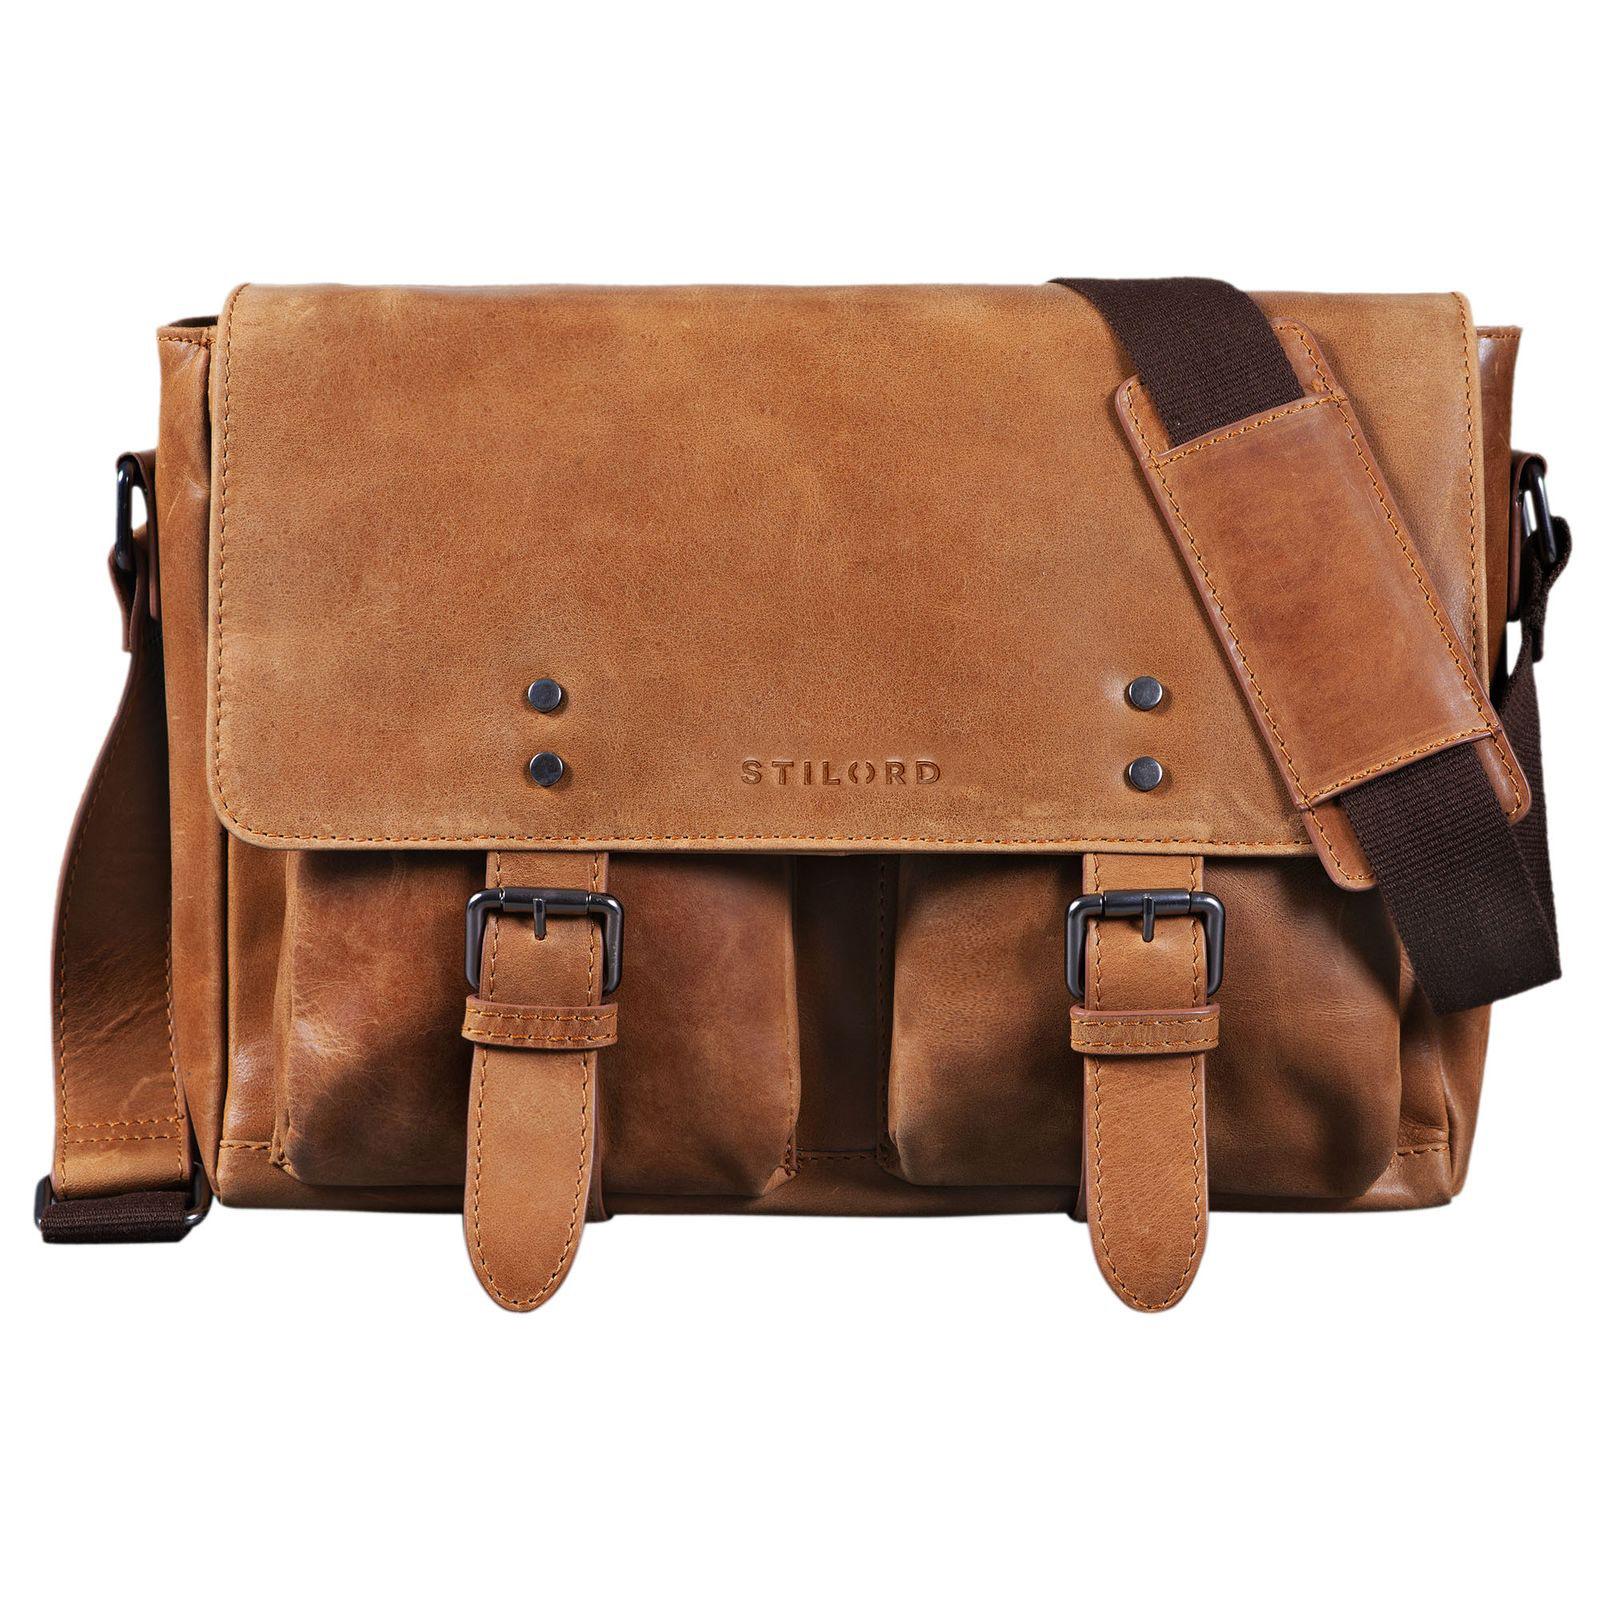 Vintage Ledertasche Messenger Bag 13 Zoll